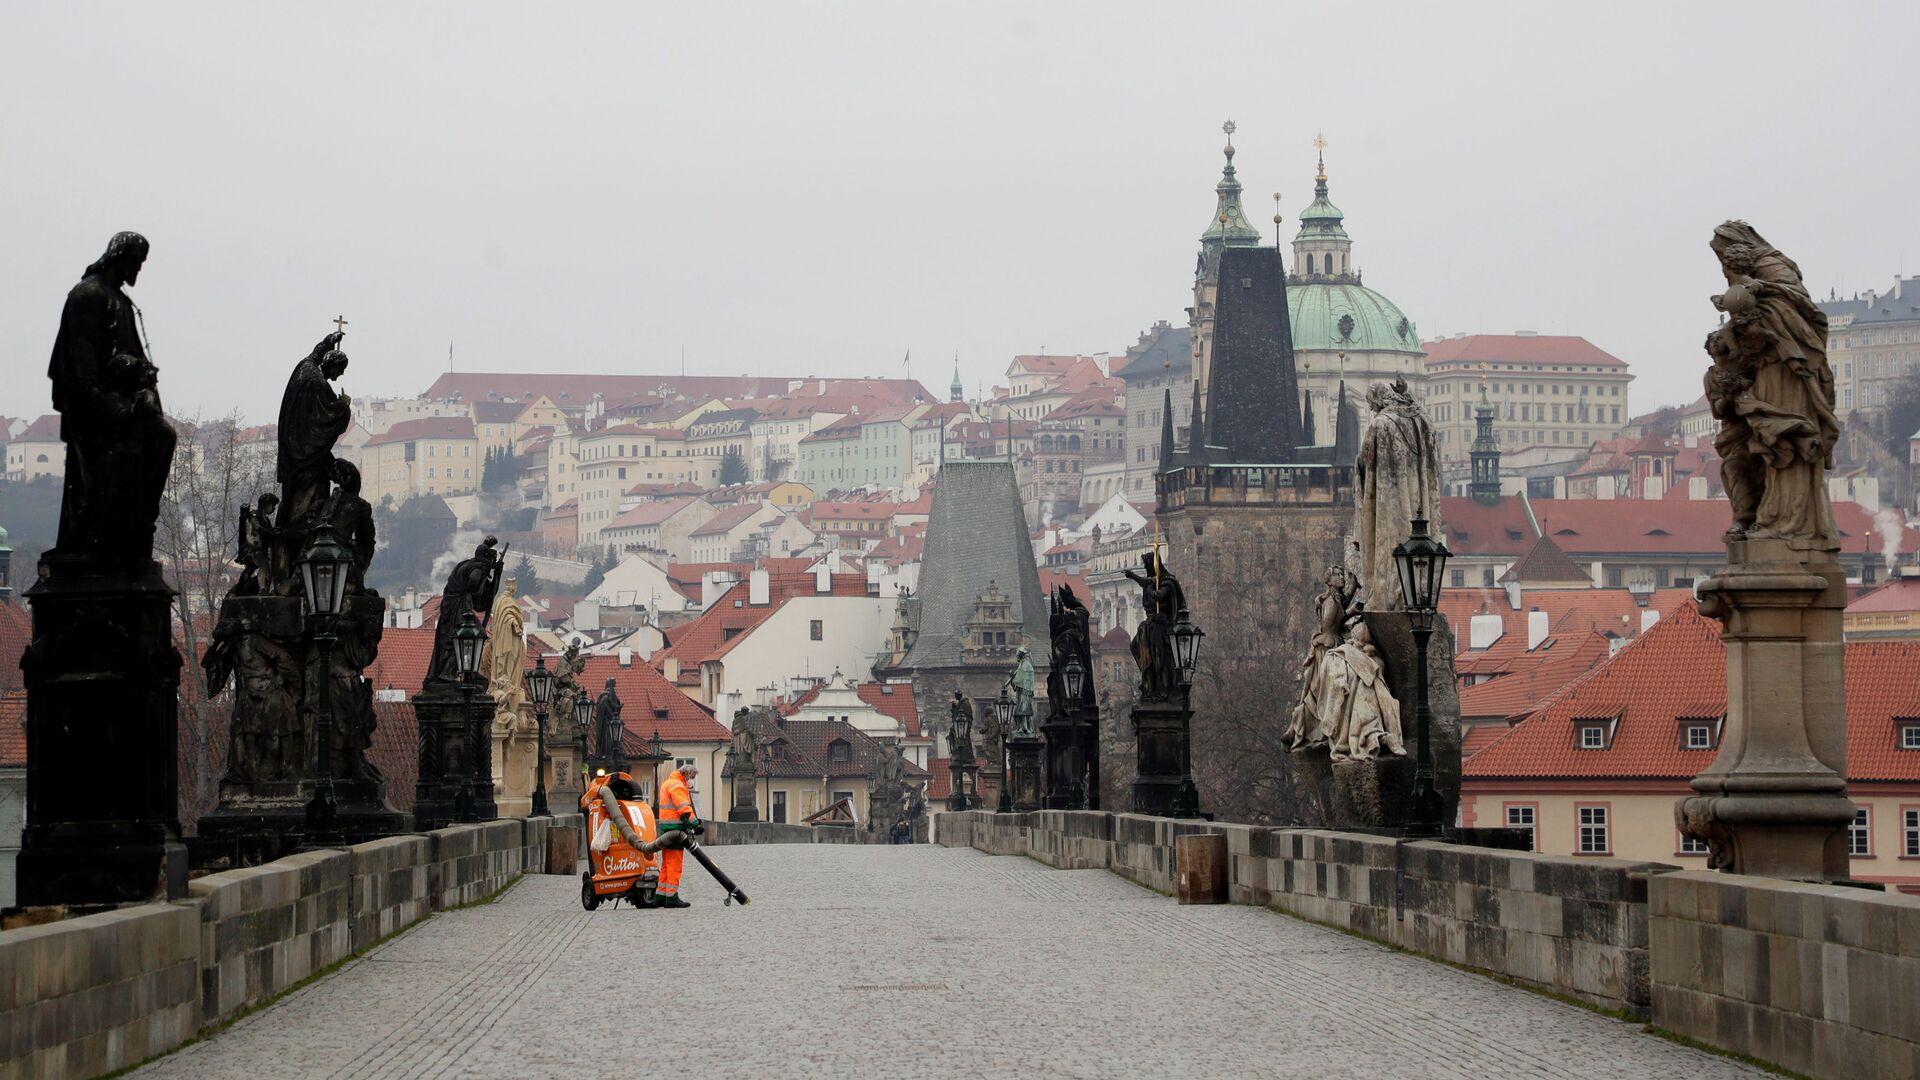 Praha, Karlův most - Sputnik Česká republika, 1920, 06.04.2021